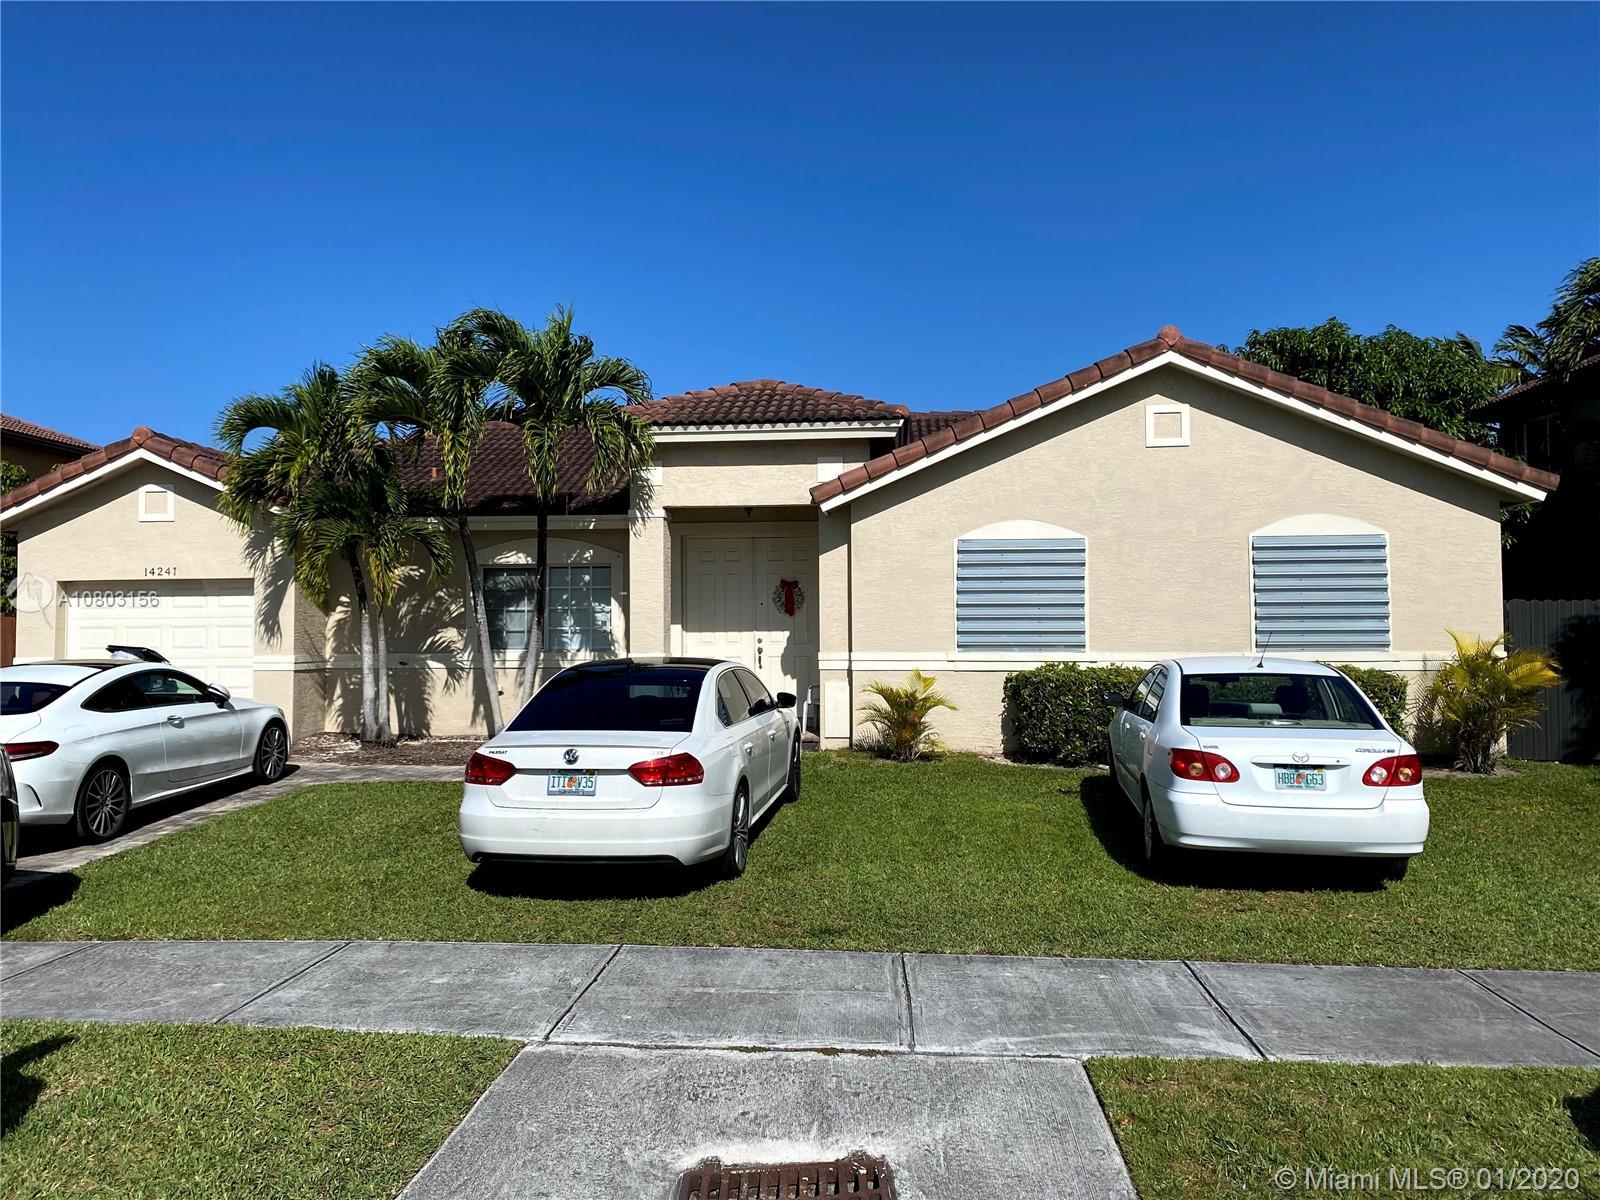 14247 SW 291st St, Homestead, FL 33033 - Homestead, FL real estate listing